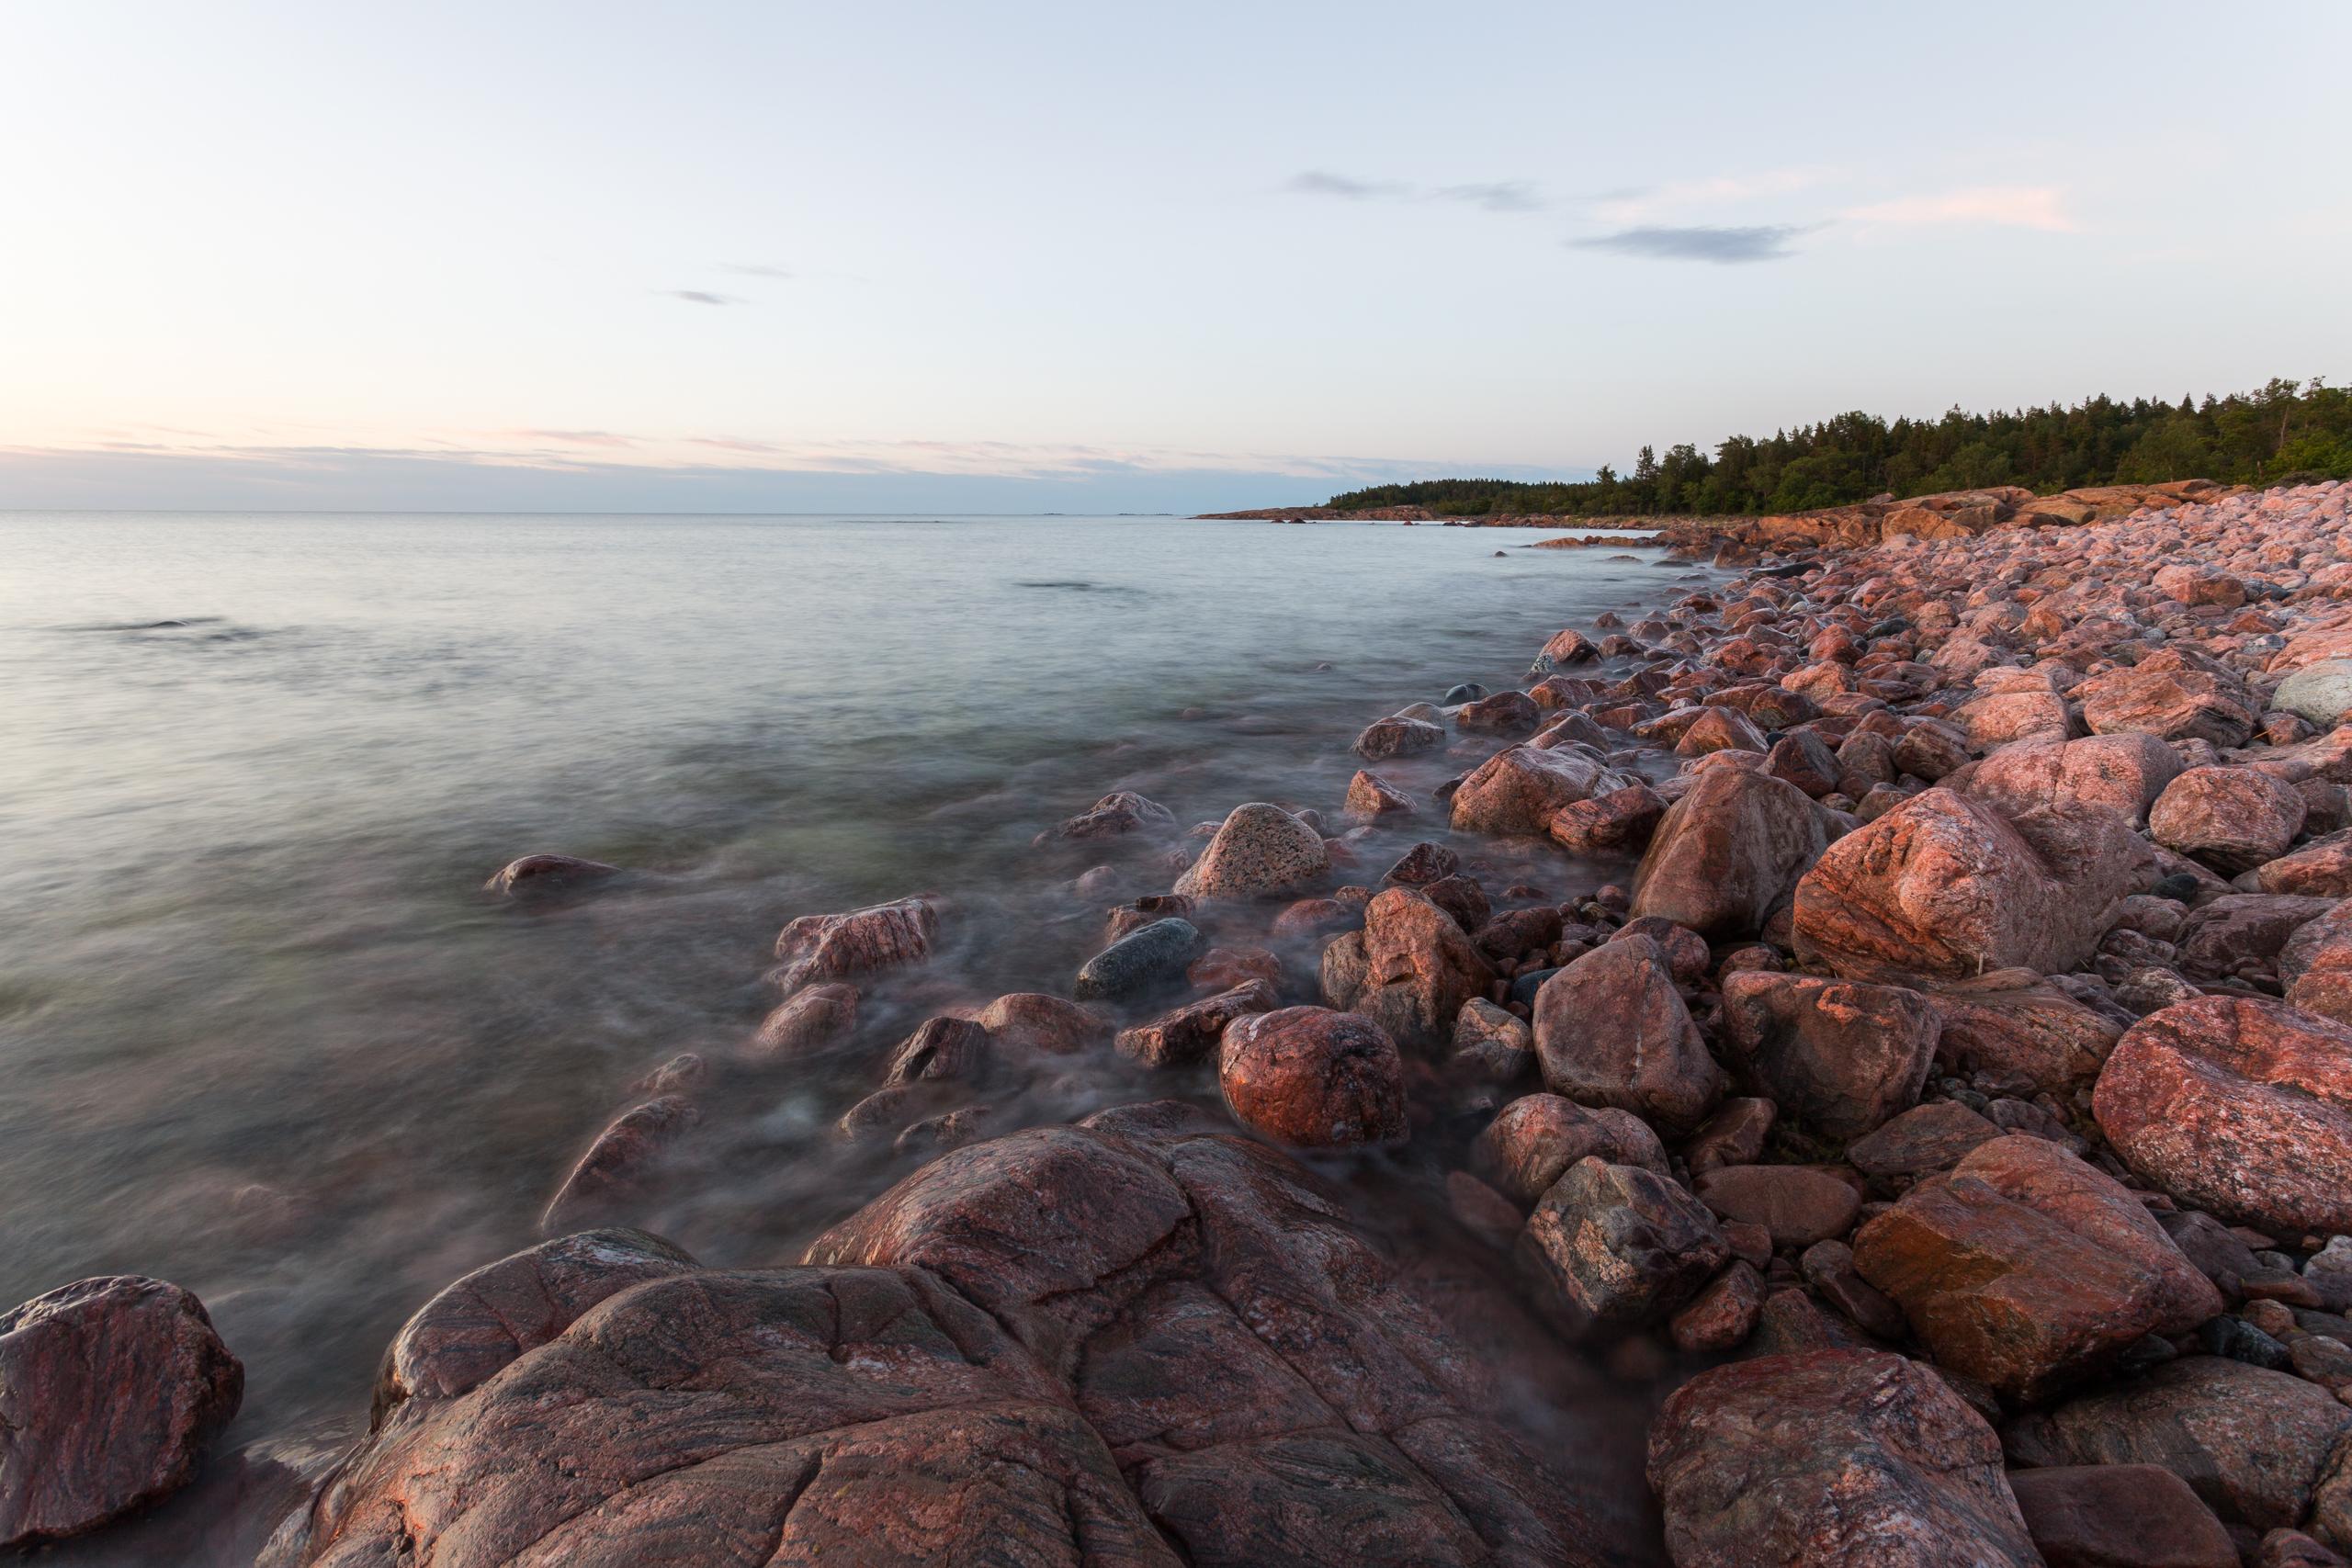 08072016-kapplasse-naturreservat